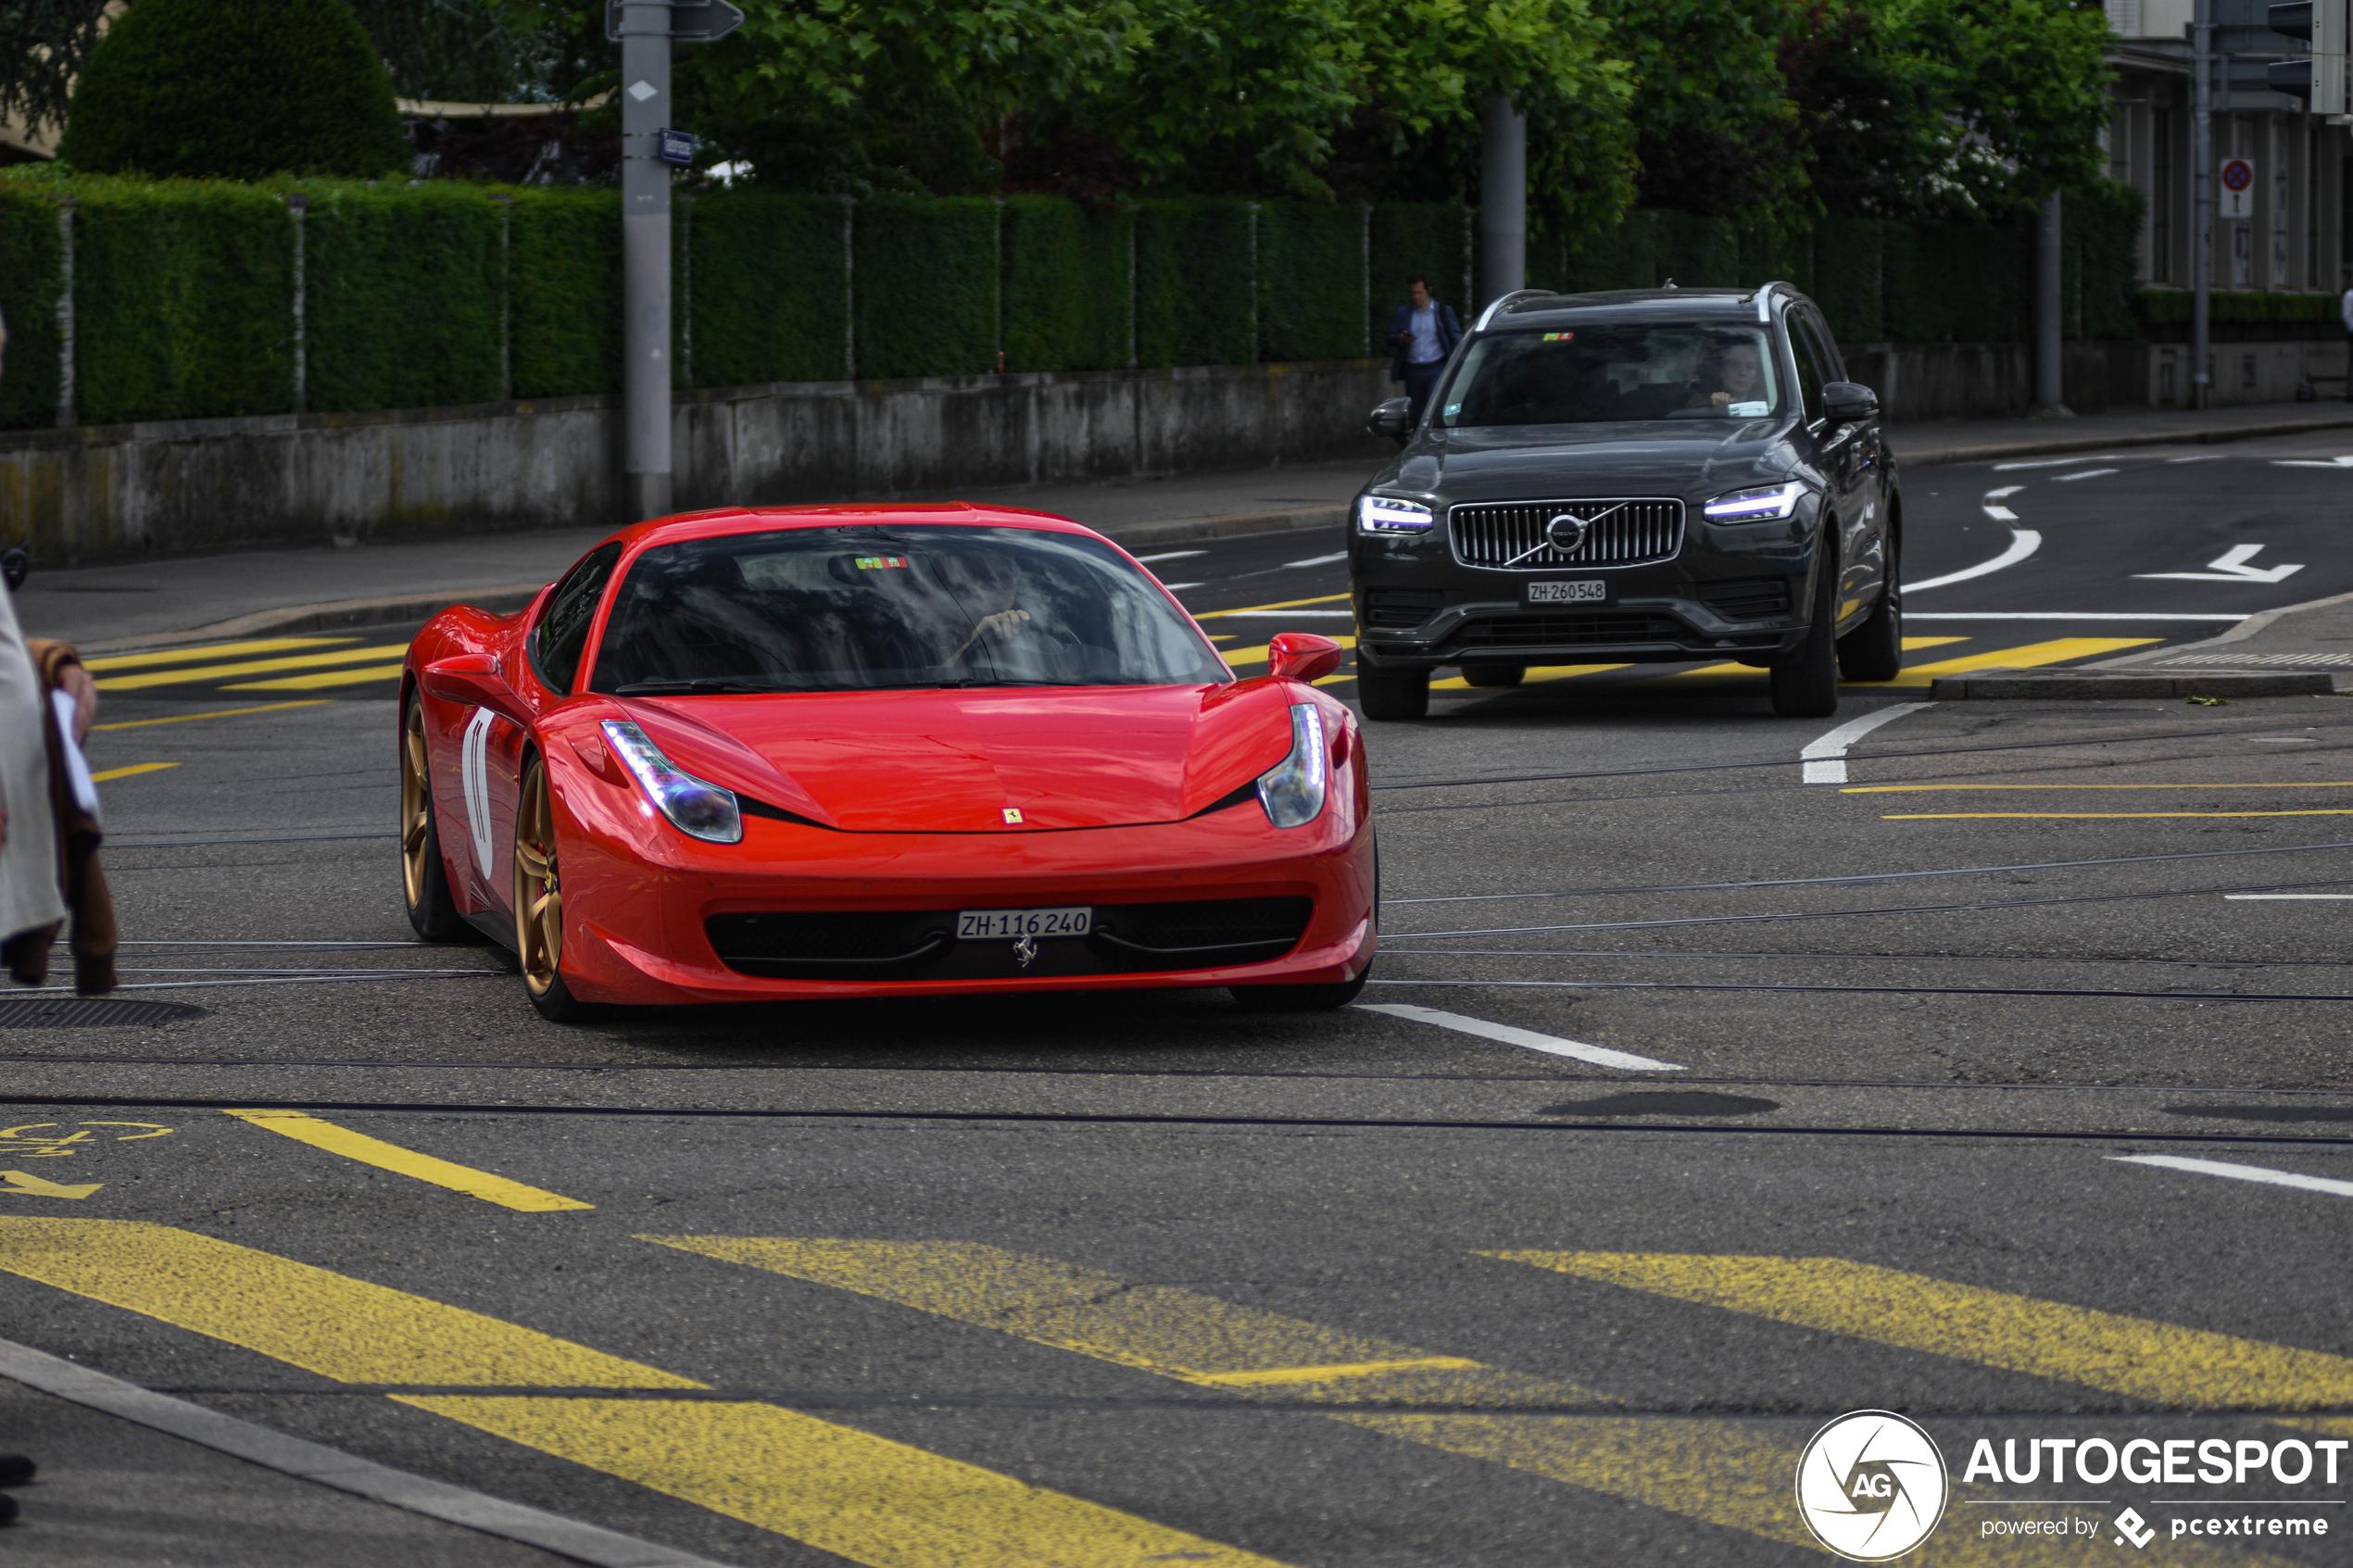 This Ferrari has an identity crisis